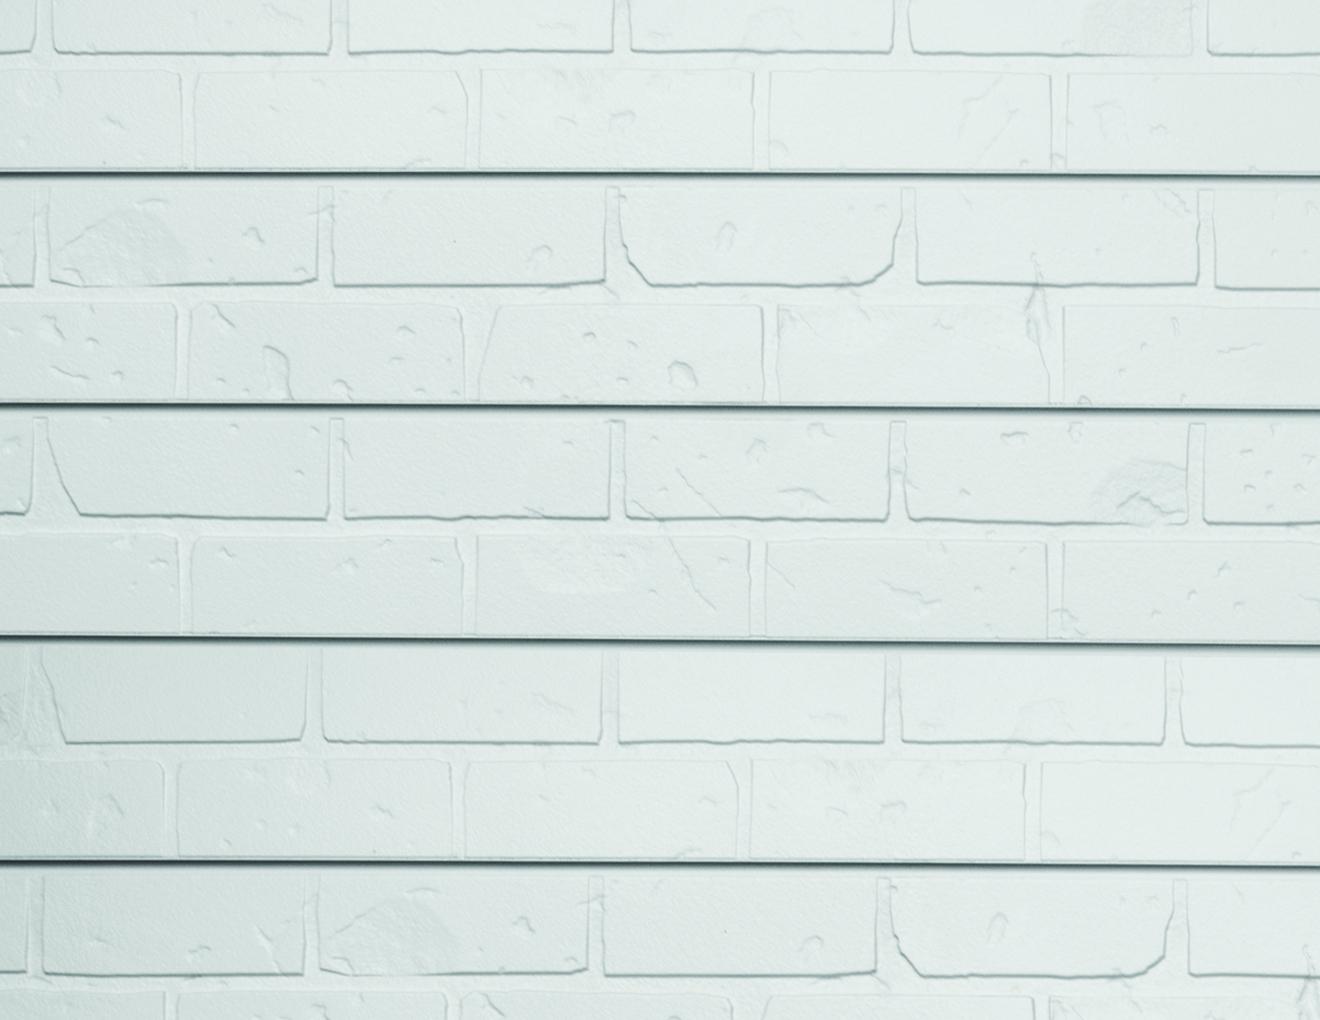 Brick white cu 11x8.5.jpg